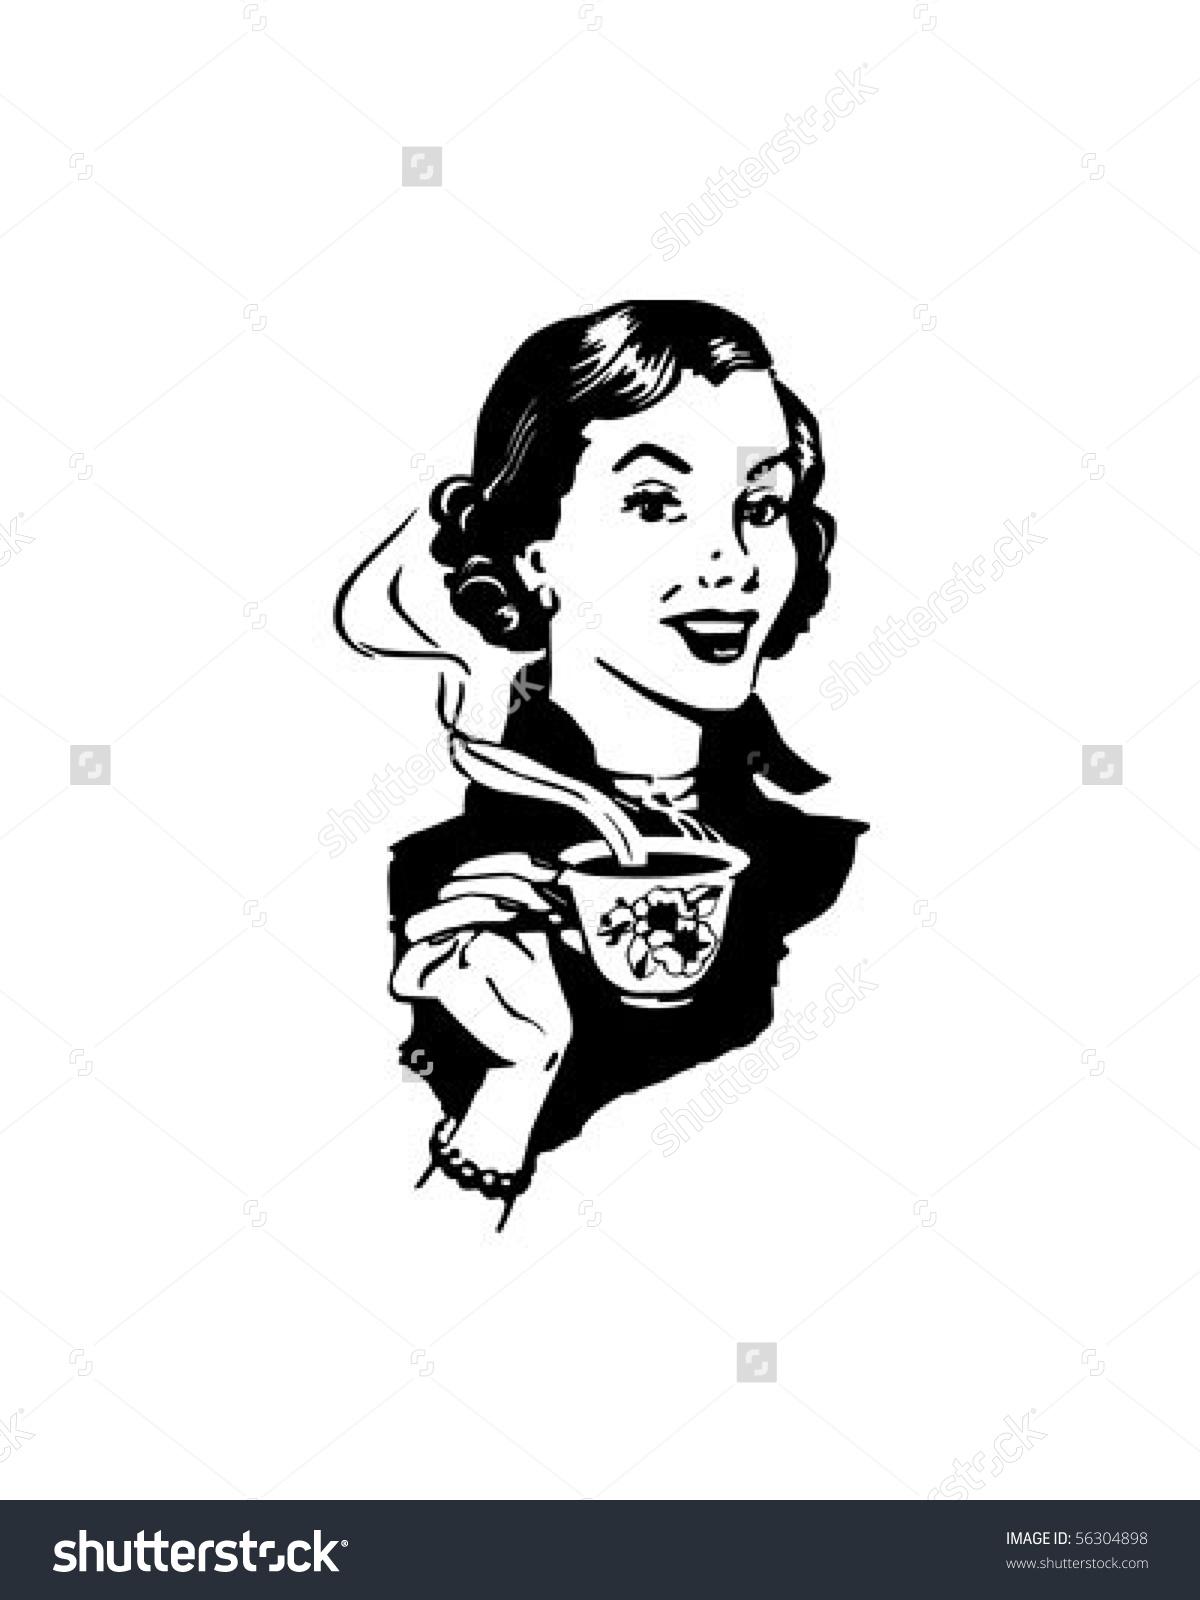 Coffee Lady Retro Clip Art Stock Vector 56304898.